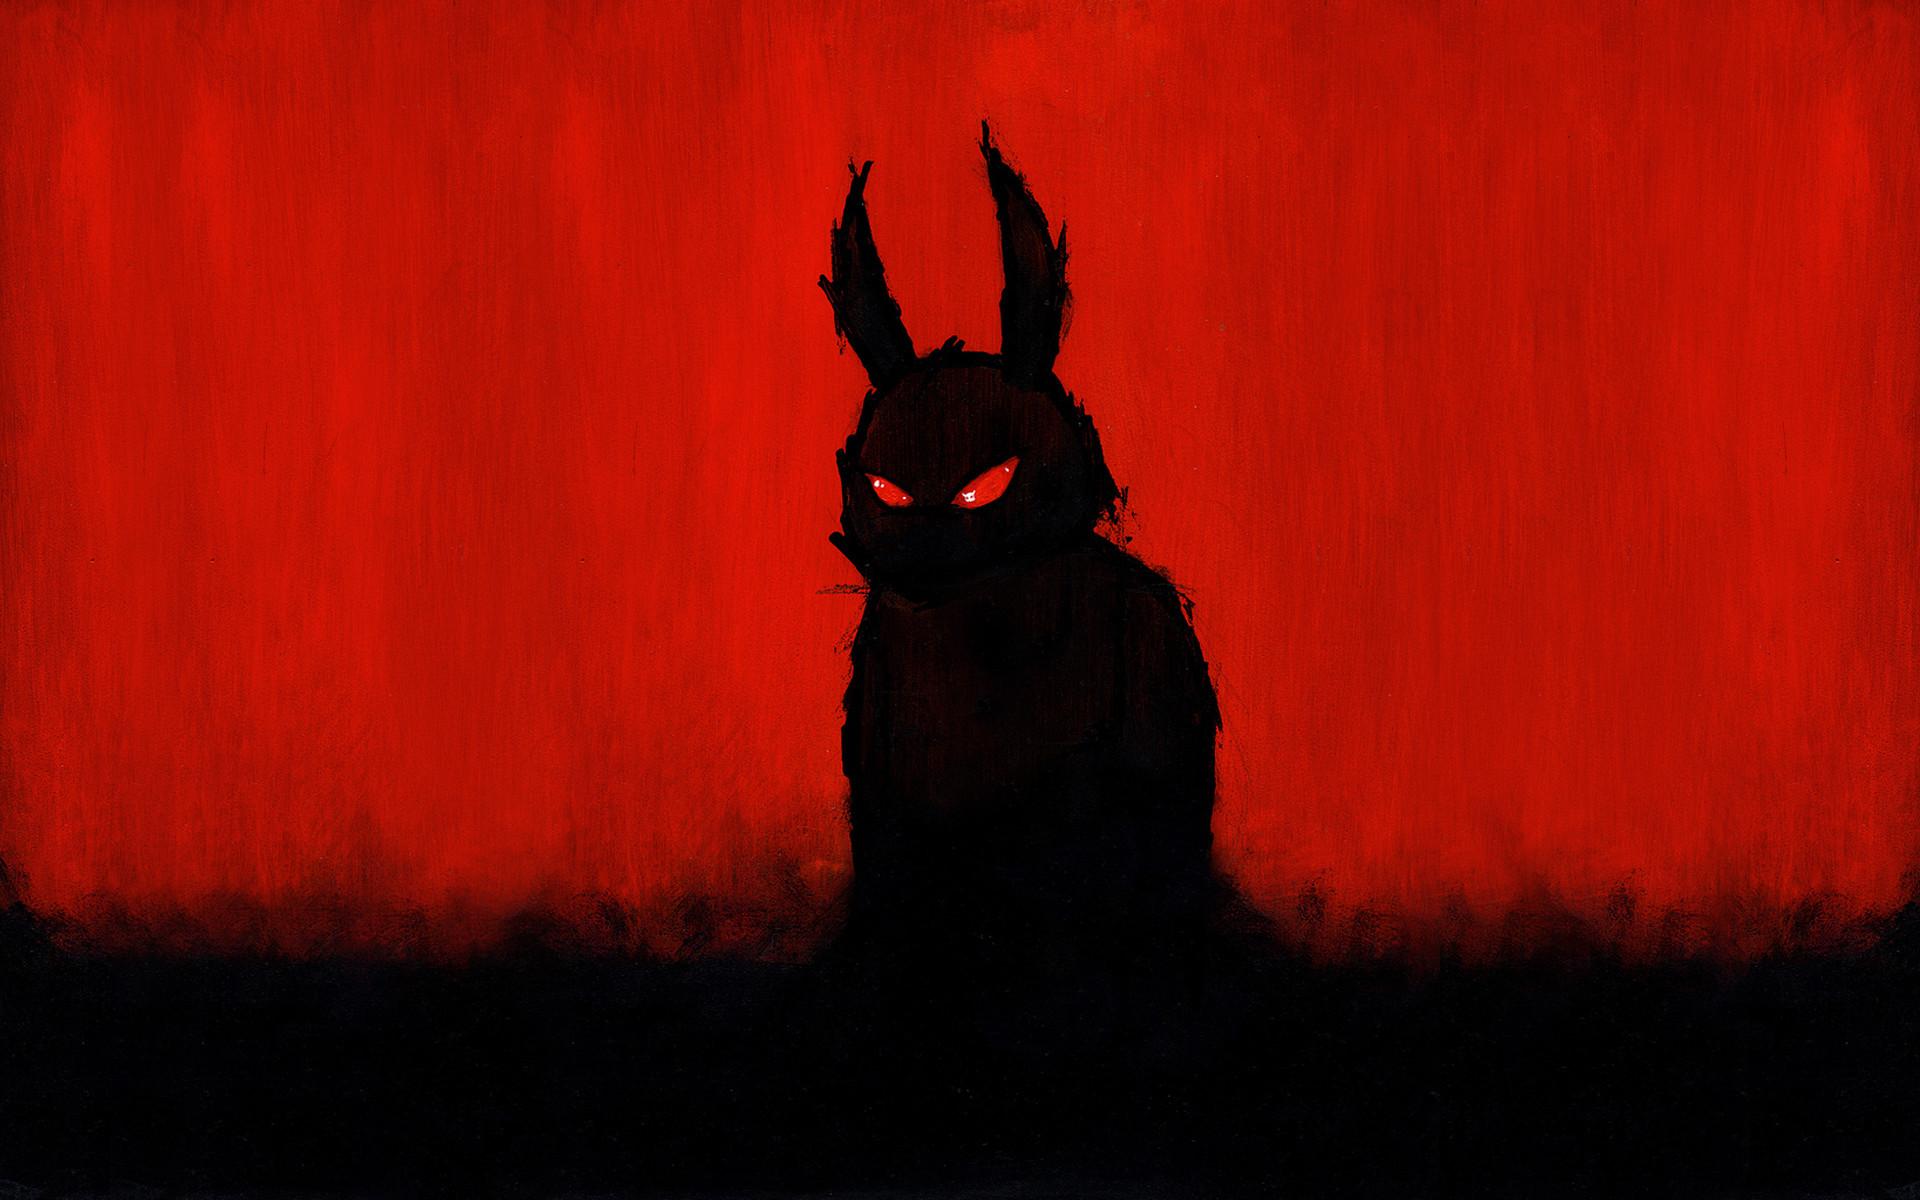 Evil Red Drawing Creepy Monster Rabbit Halloween Wallpaper At Dark  Wallpapers